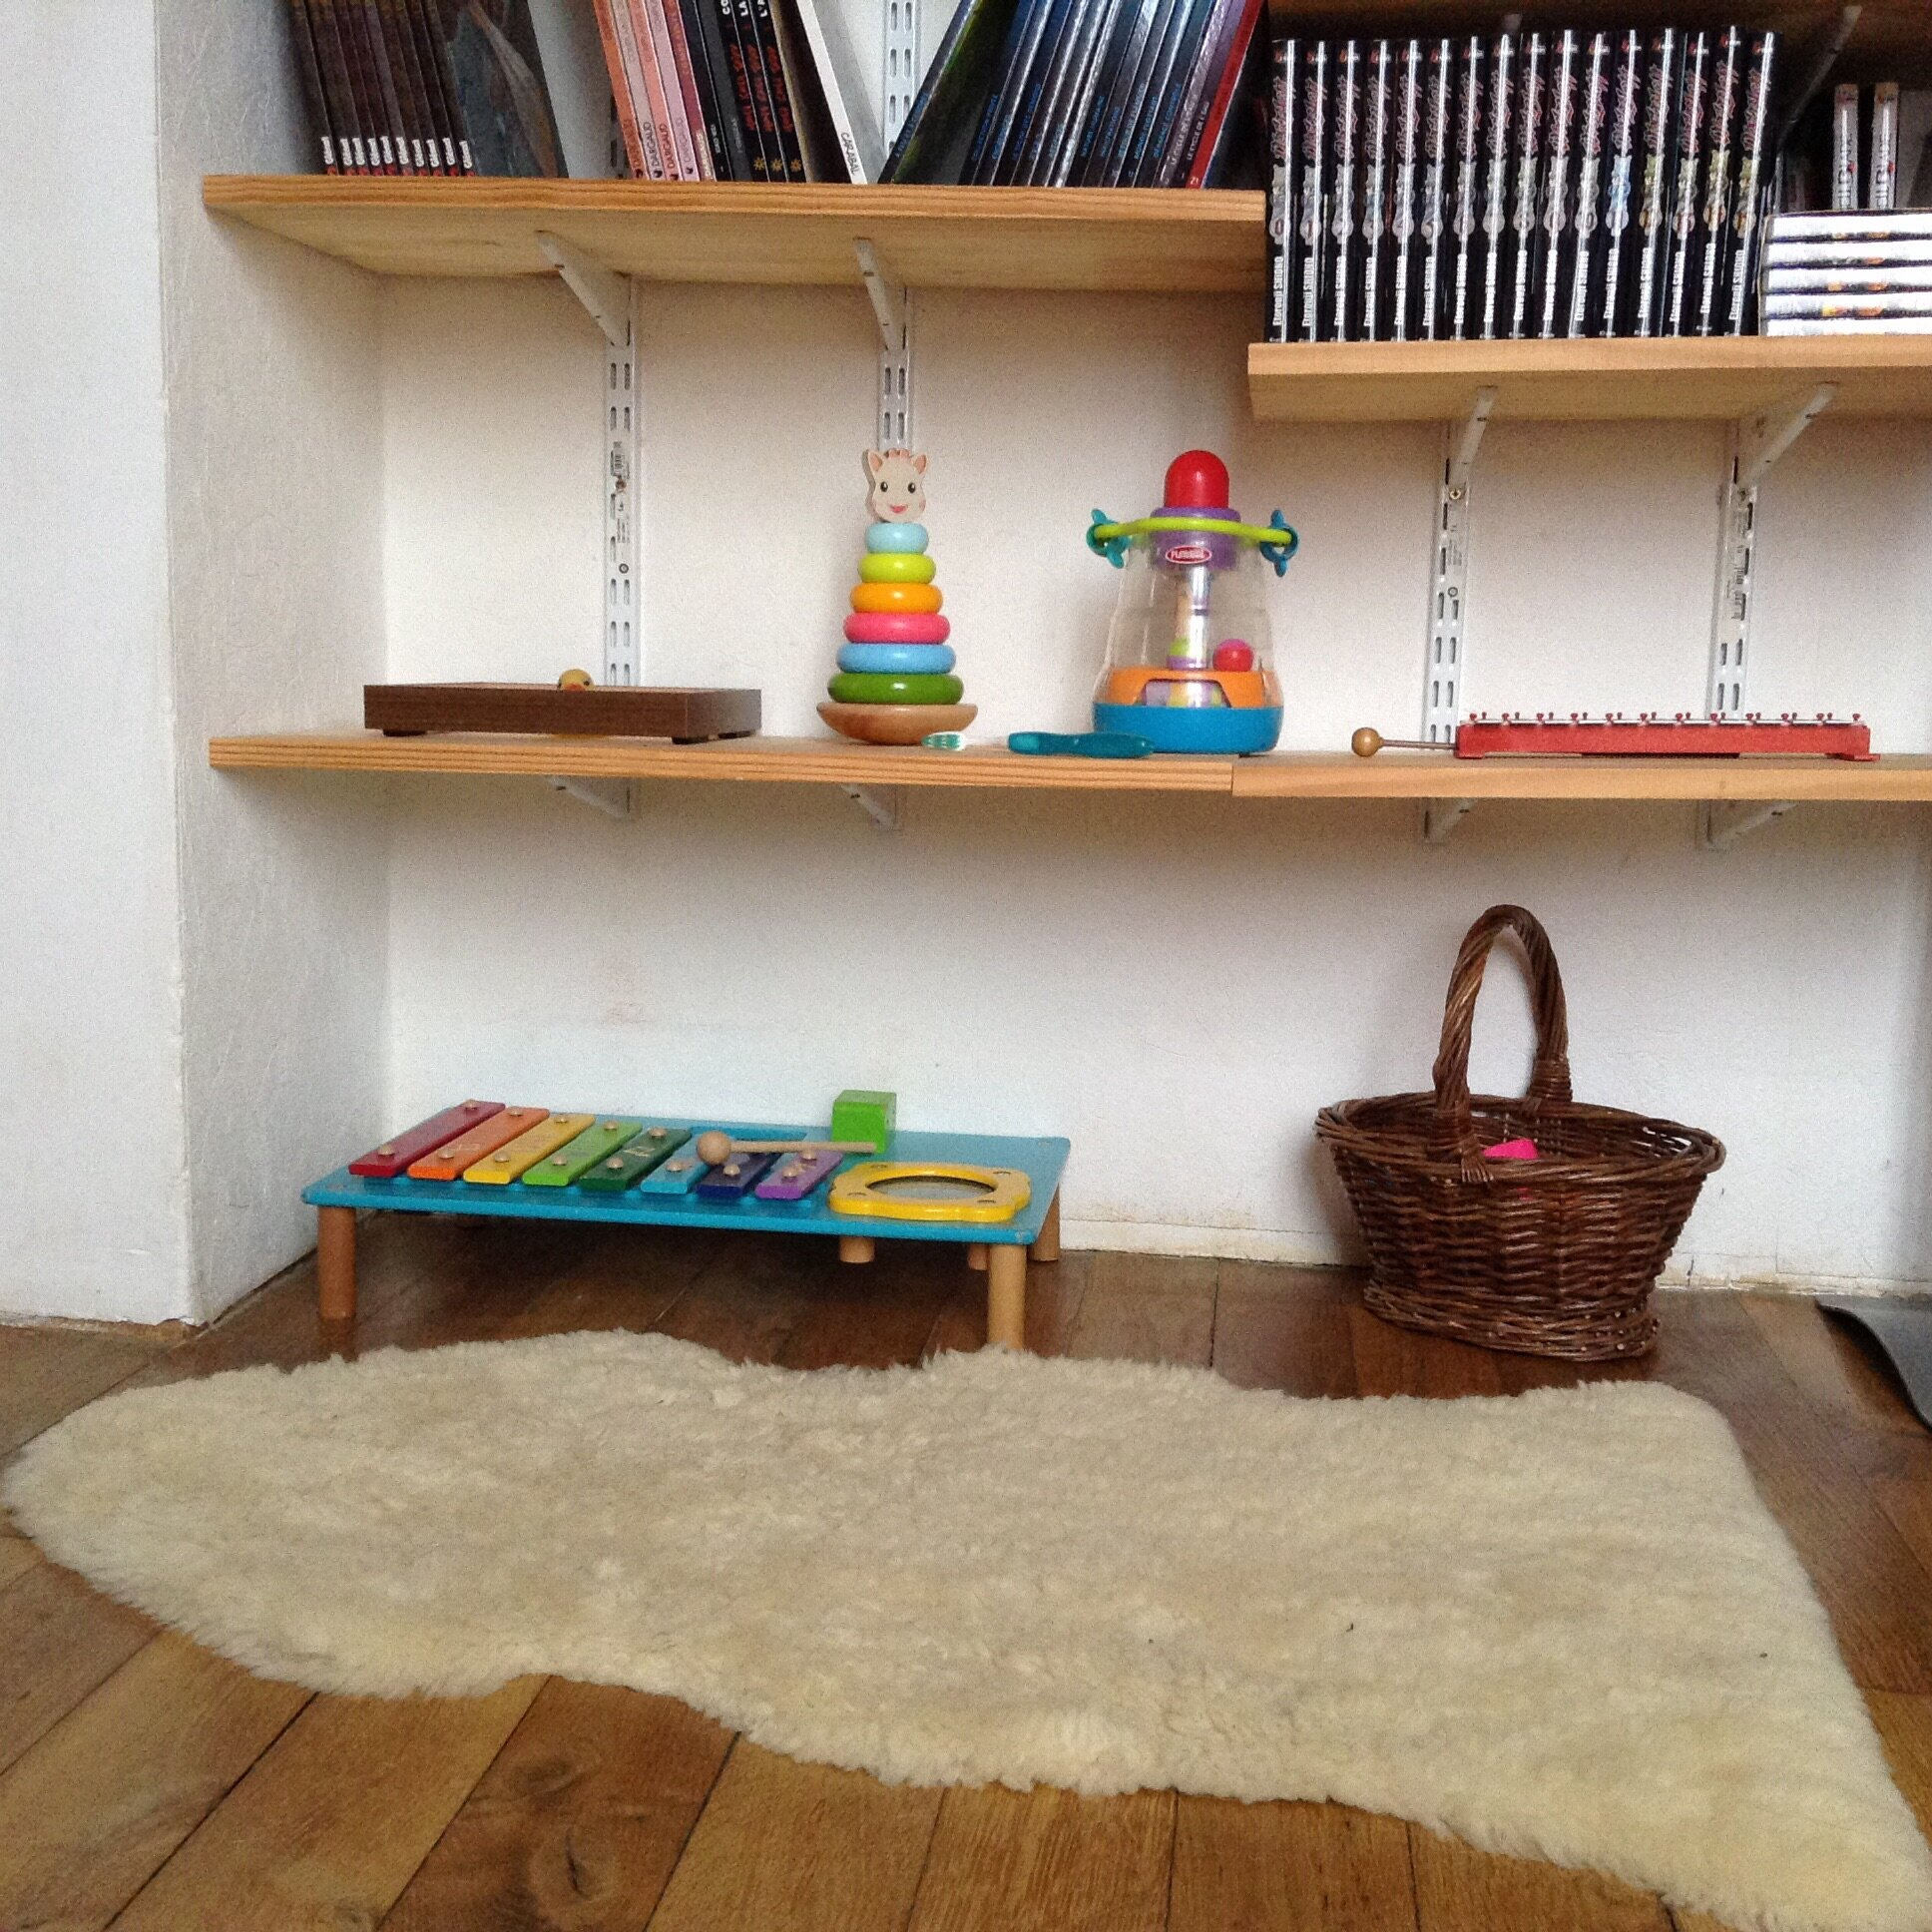 bibliotheque familiale